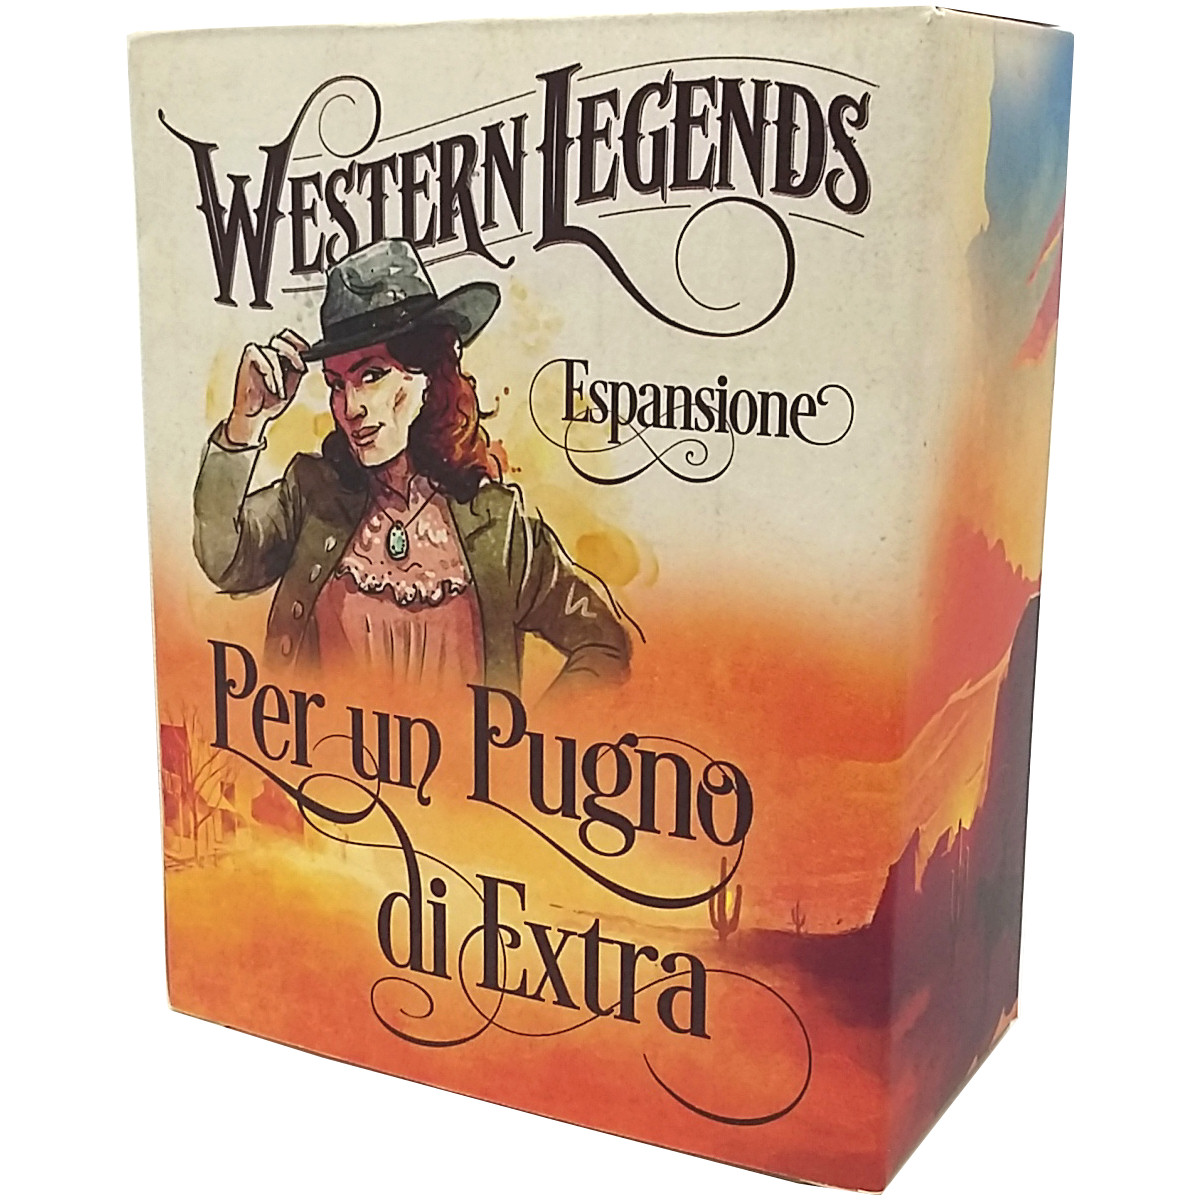 WESTERN LEGENDS - PER UN PUGNO DI EXTRA - ESPANSIONE